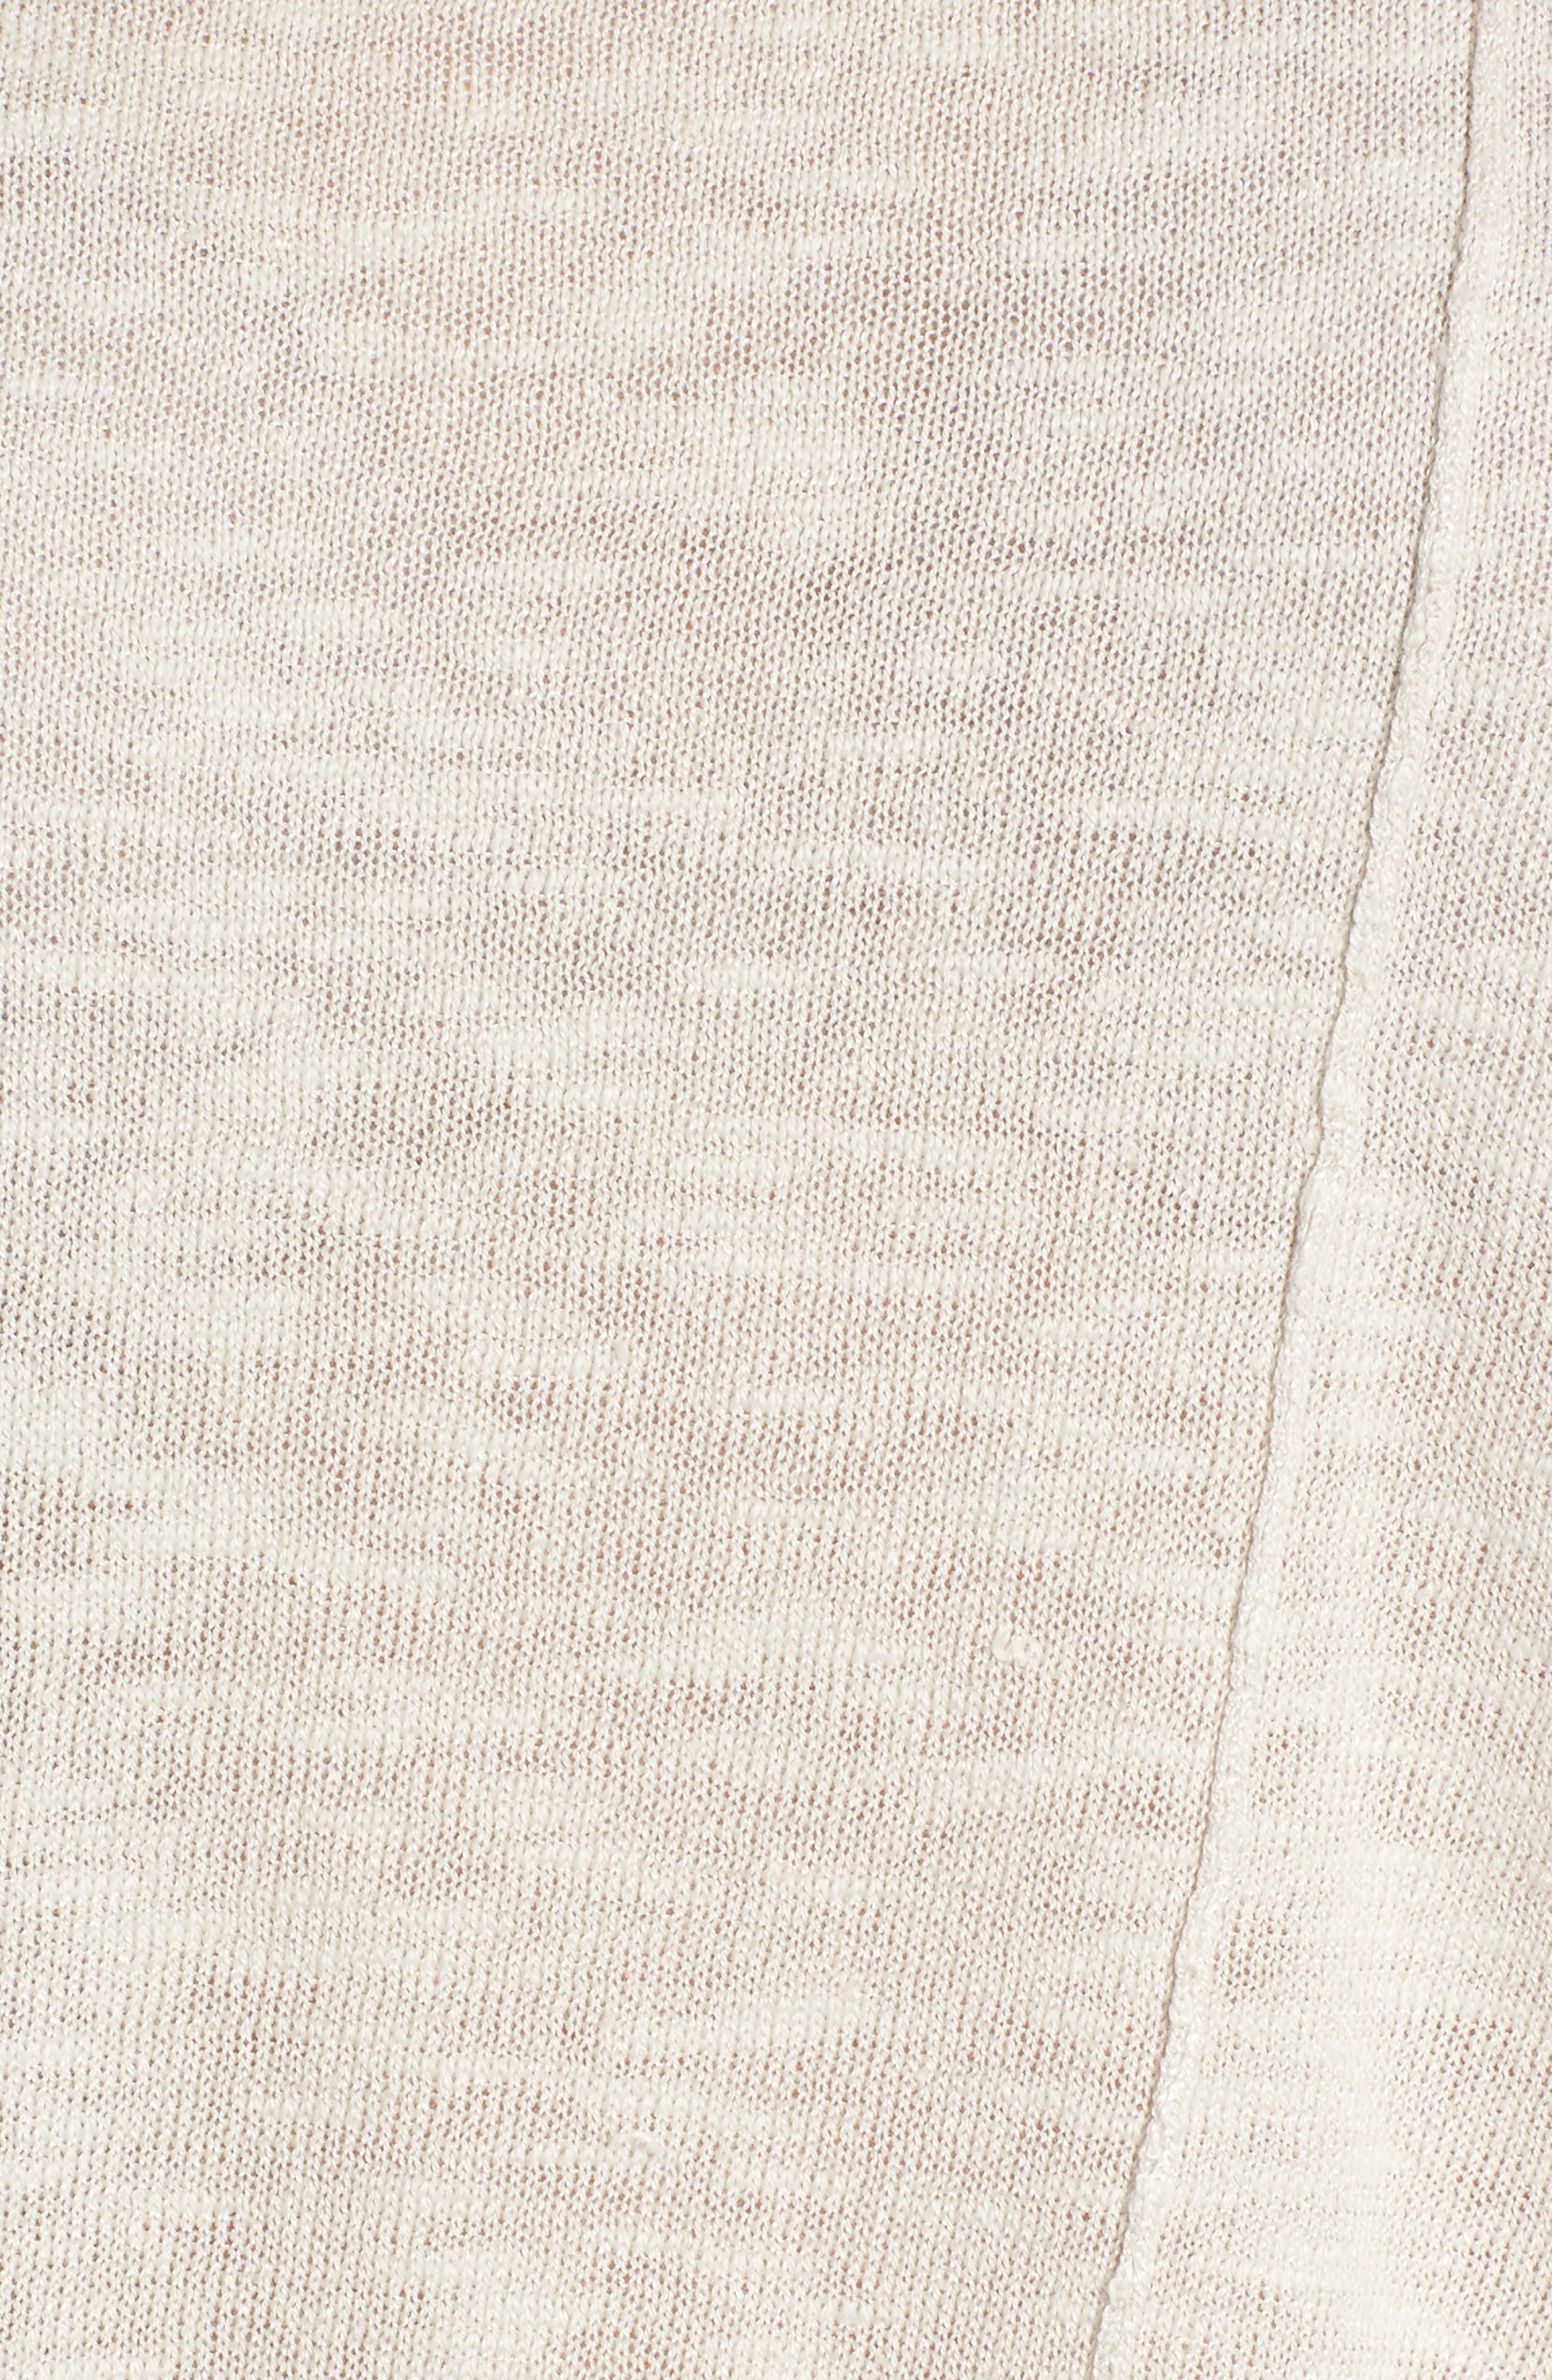 Cap Sleeve Organic Linen & Cotton Scoop Neck Top,                             Alternate thumbnail 65, color,